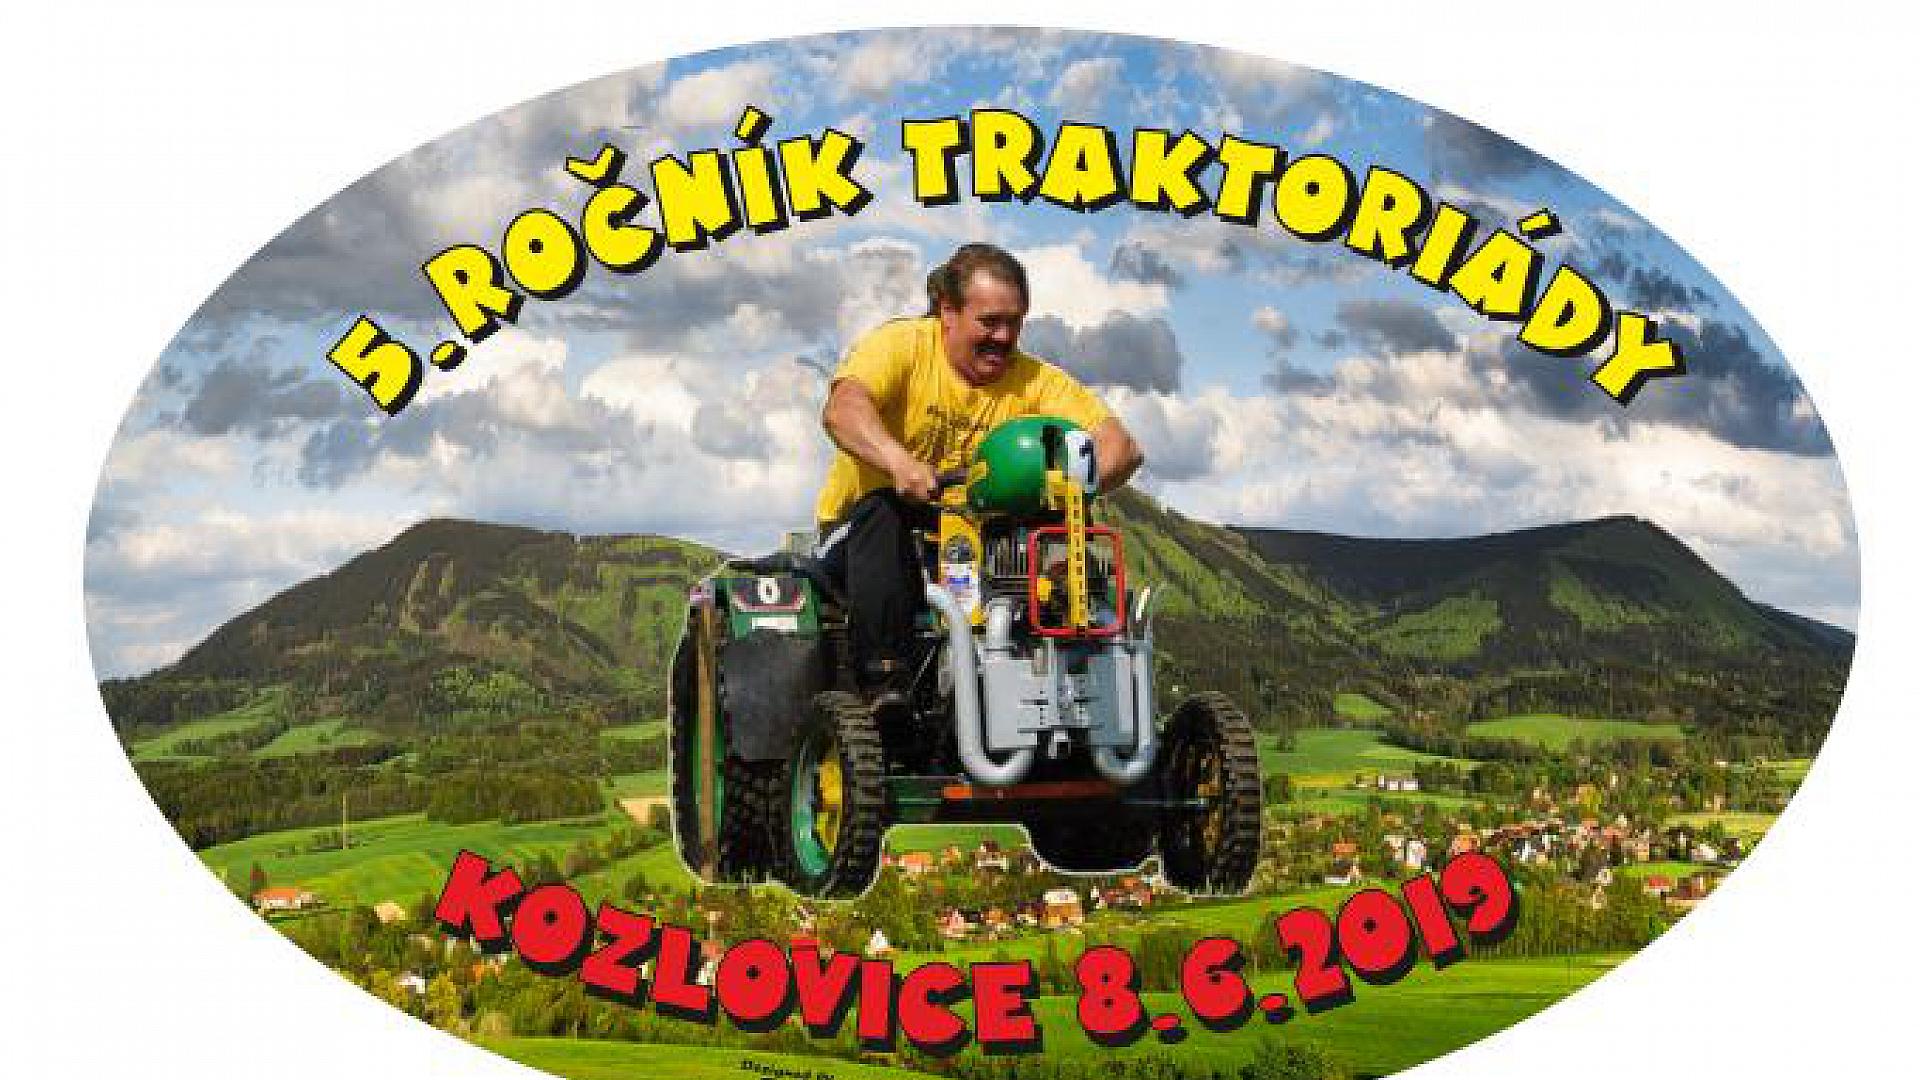 Kuchař - 5. ročník traktoriády